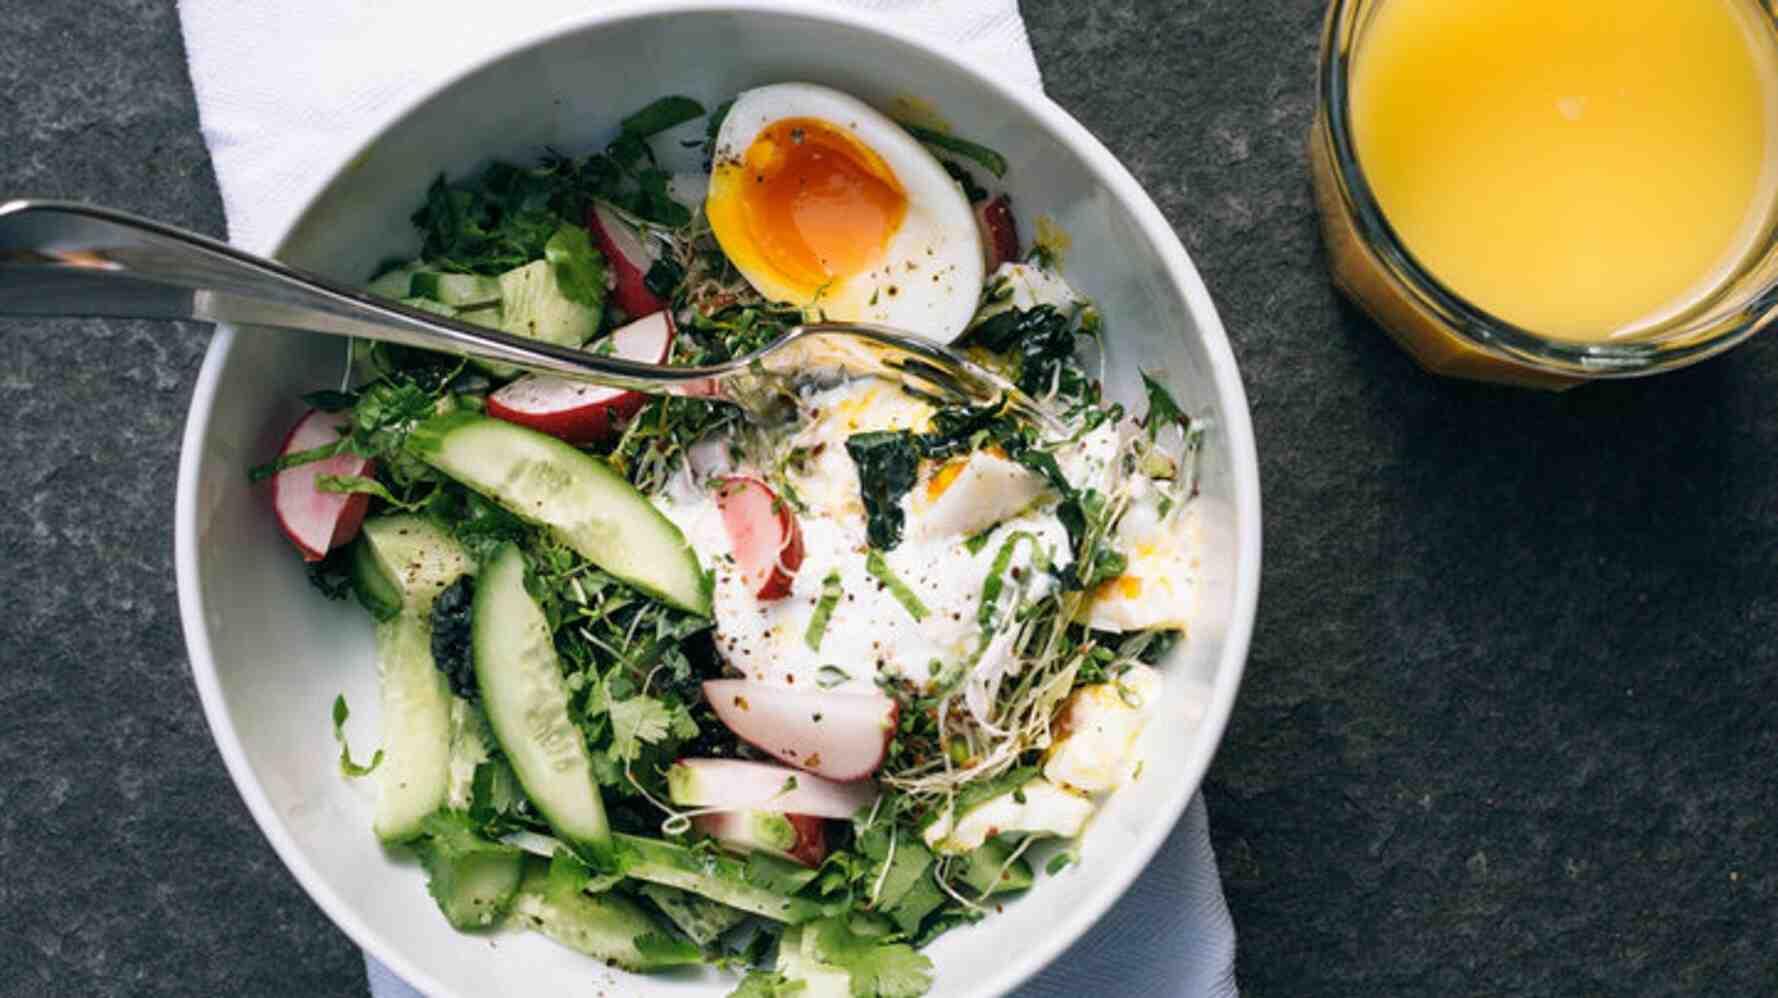 Quand consommer la salade ?